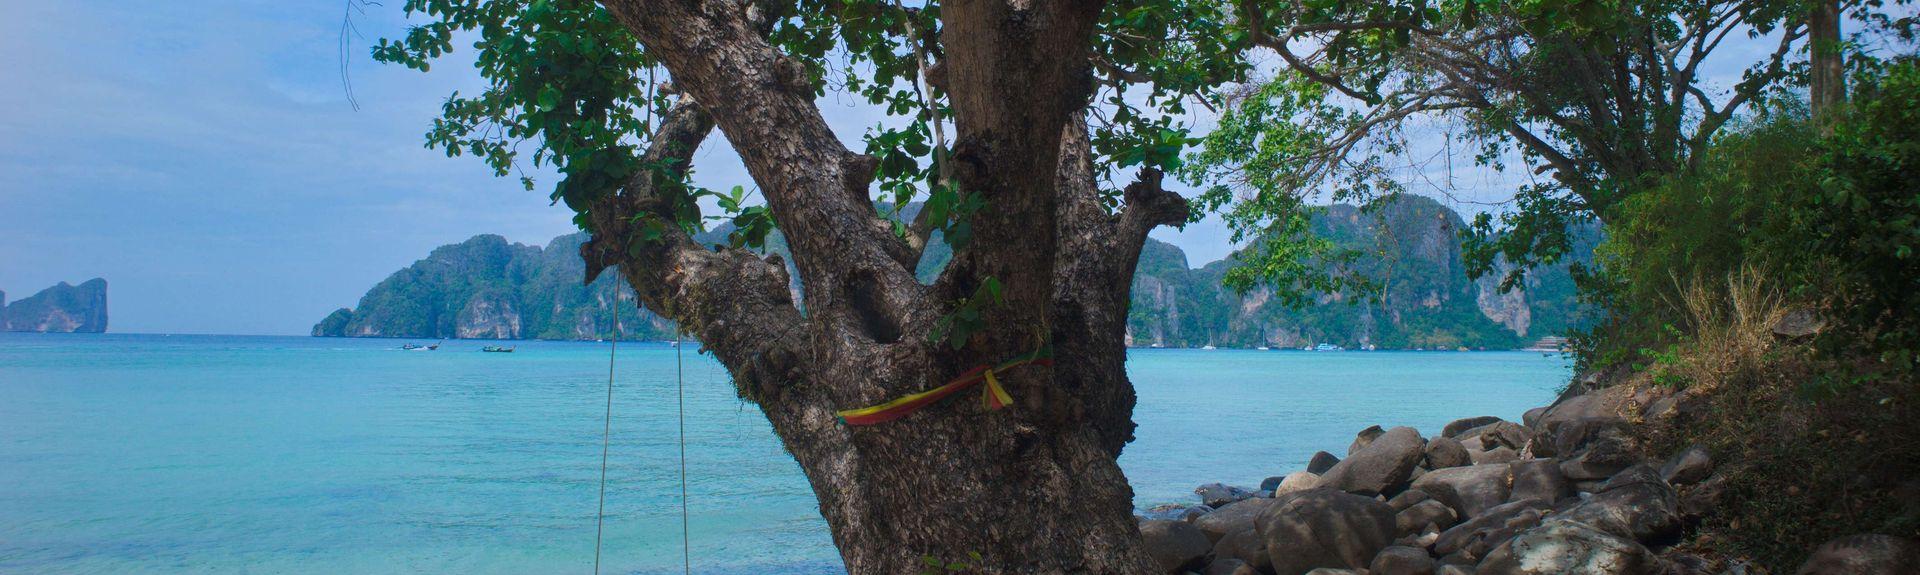 Nong Thale, Krabi, Província de Krabi, Tailândia